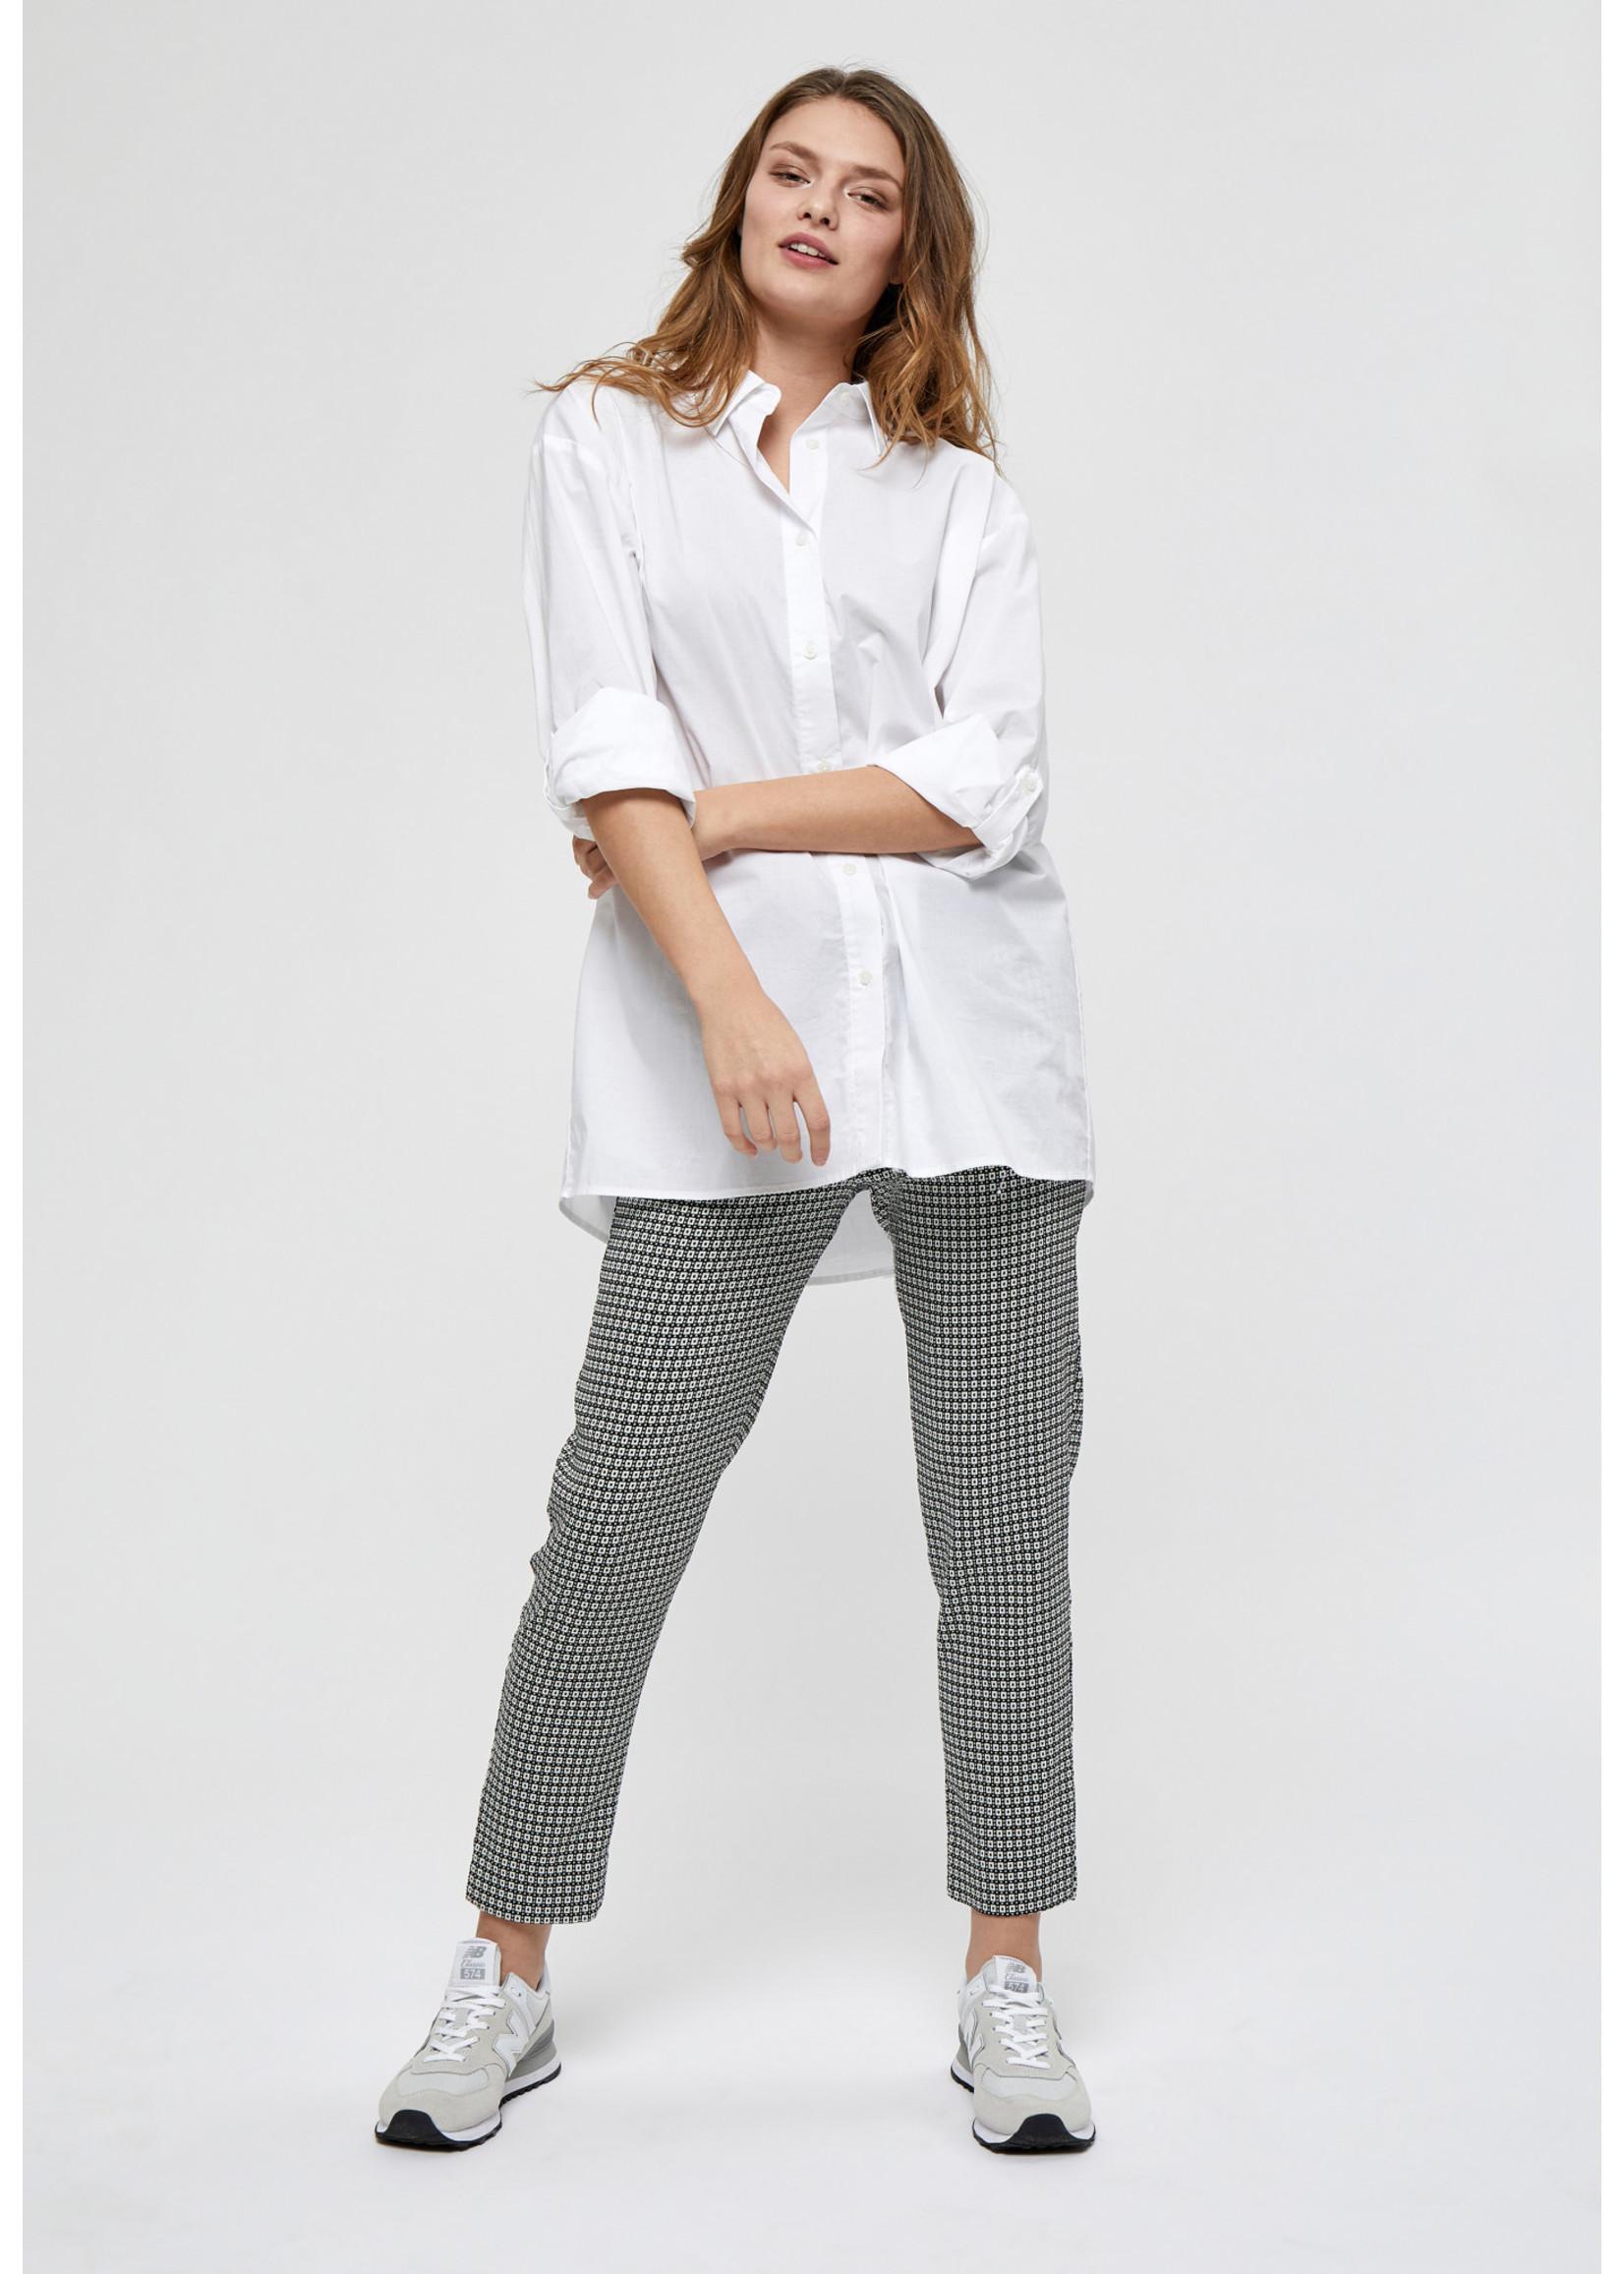 PEPPERCORN Netta Shirt WHITE